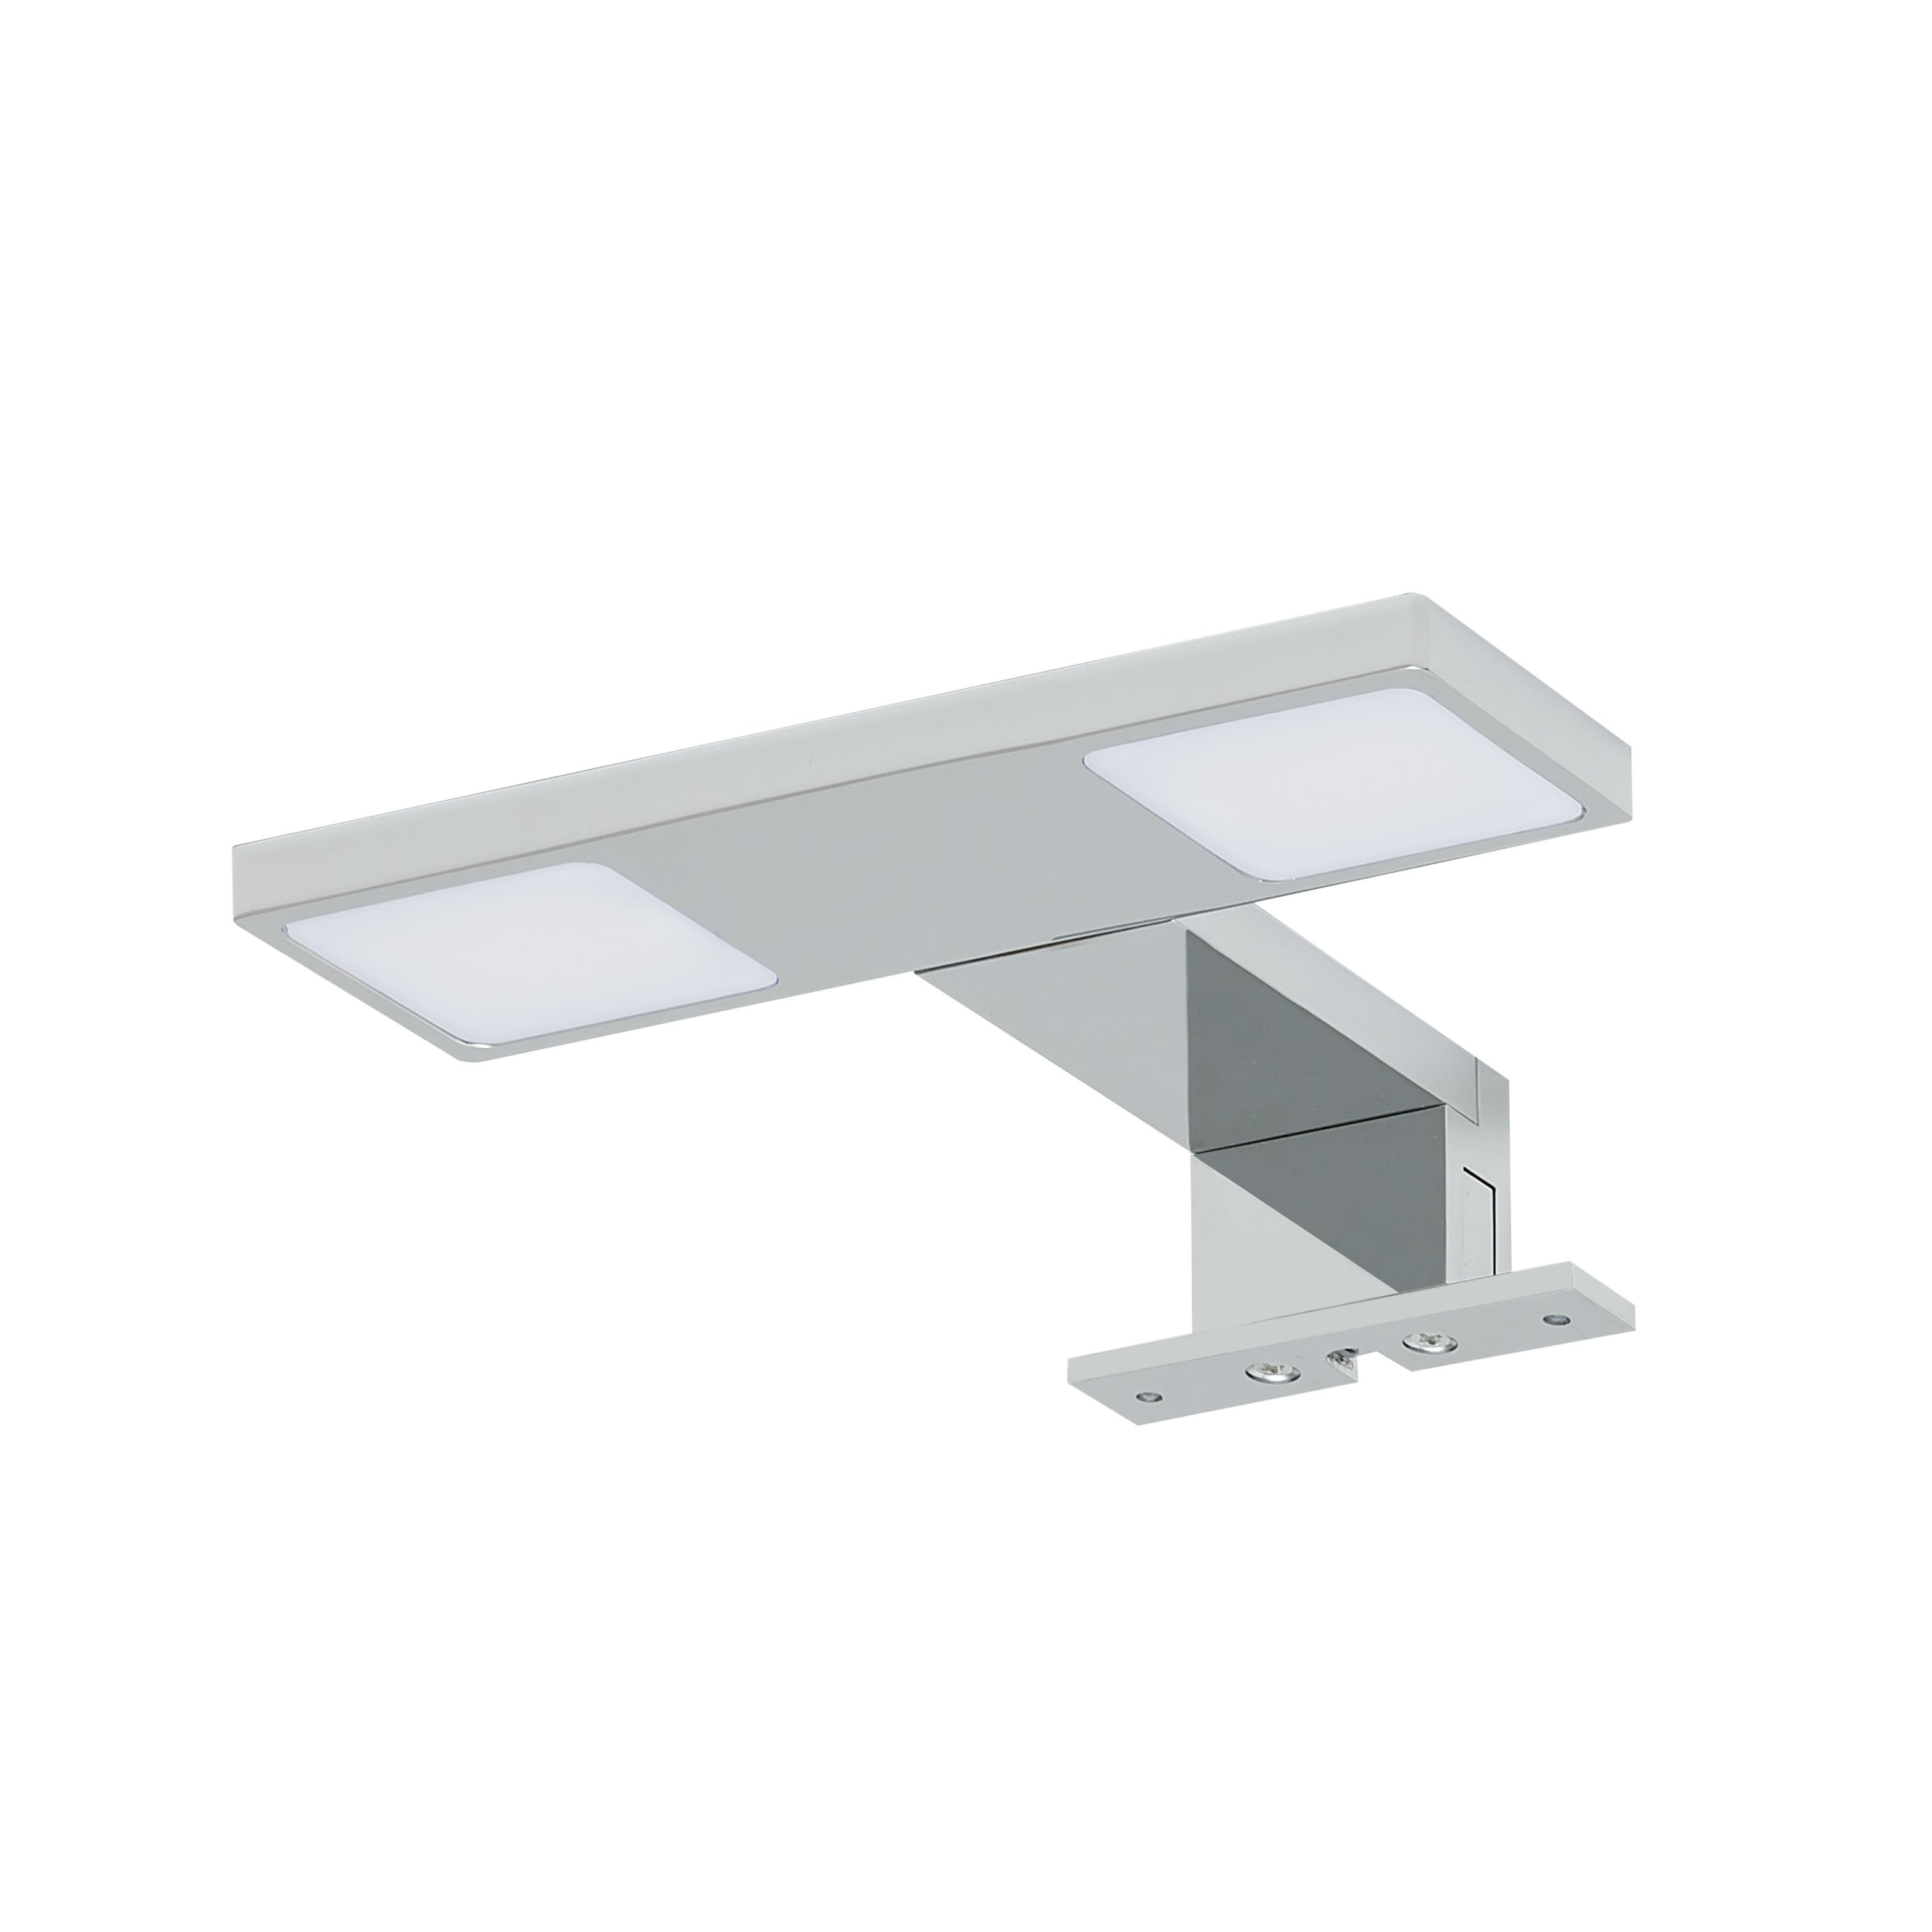 Kronos 18cm LED-verlichting